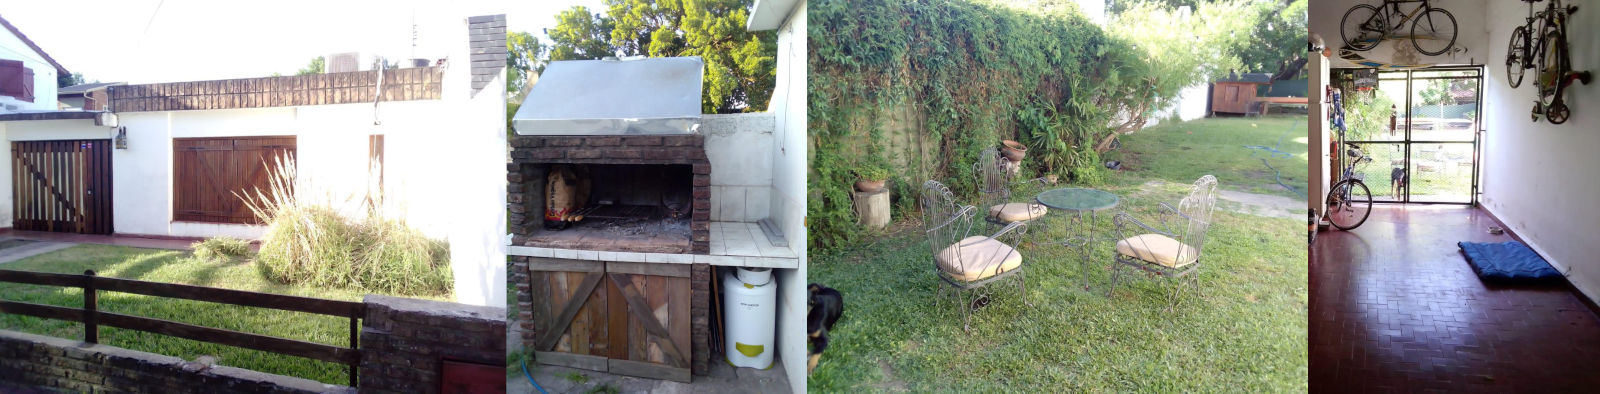 **NUEVO INGRESO** Salvat 1700: barrio Lomas de Alberdi